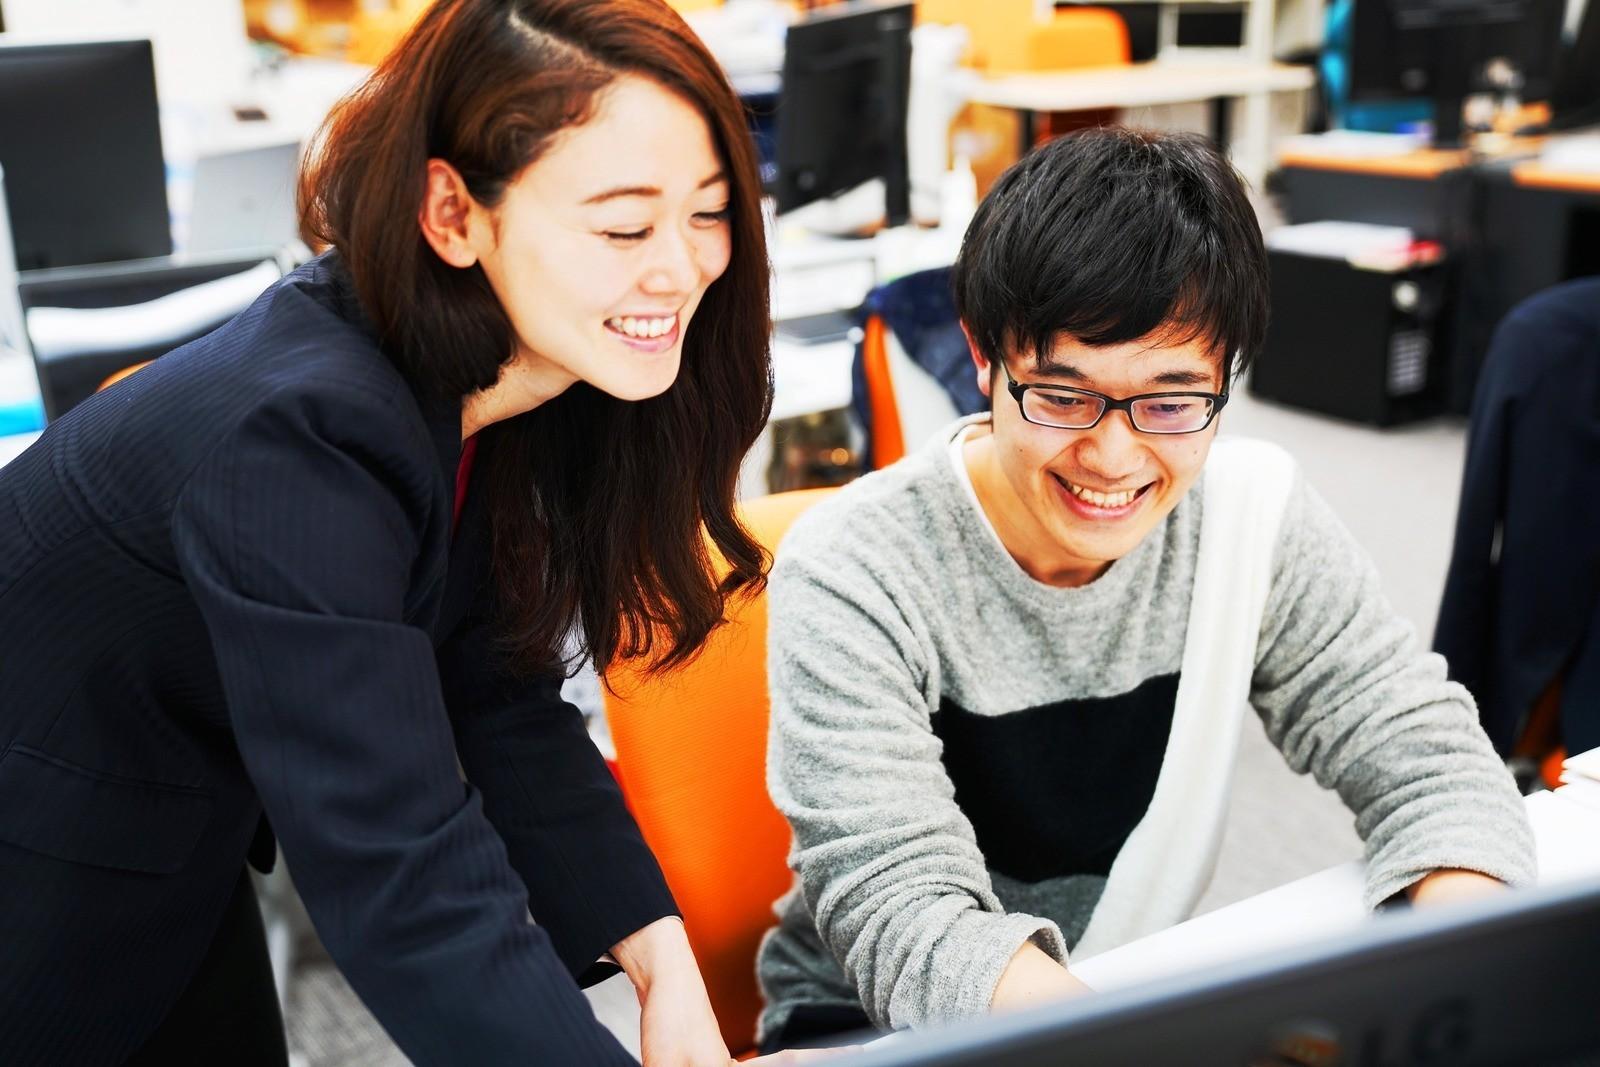 IoTエンジニア募集!テレビ×全国に広く届くプロダクトの研究・開発です!